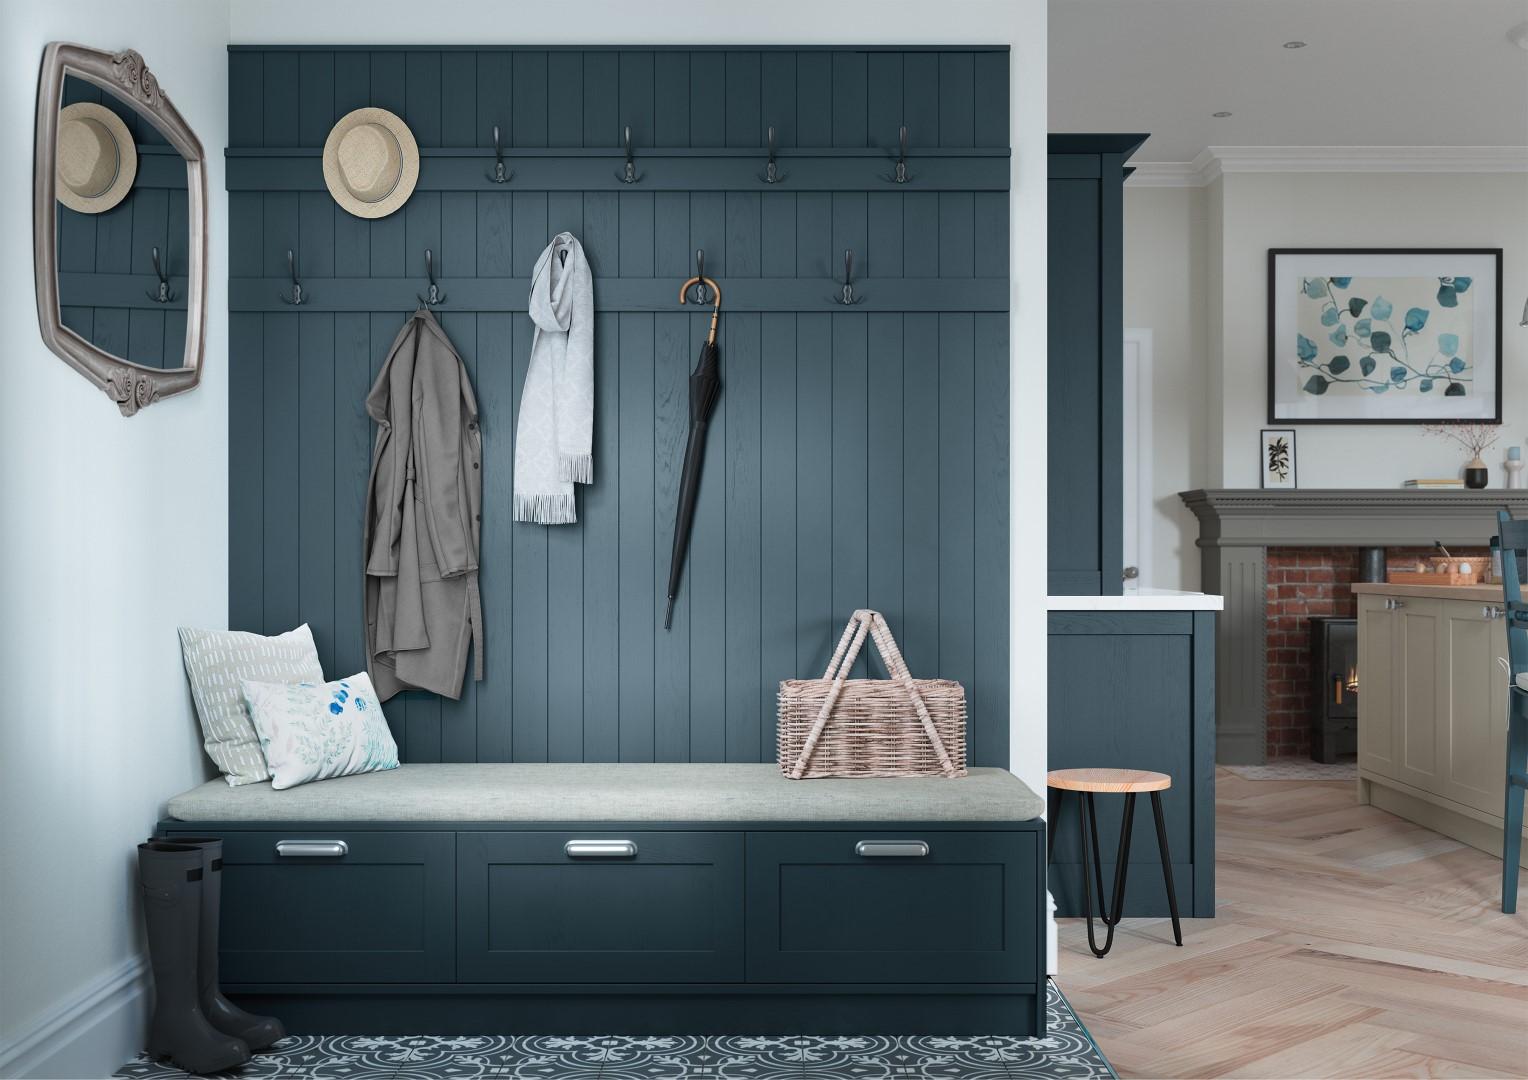 Aldana Stone and Marine - Kitchen Design - Alan Kelly Kitchens - Waterford - 4